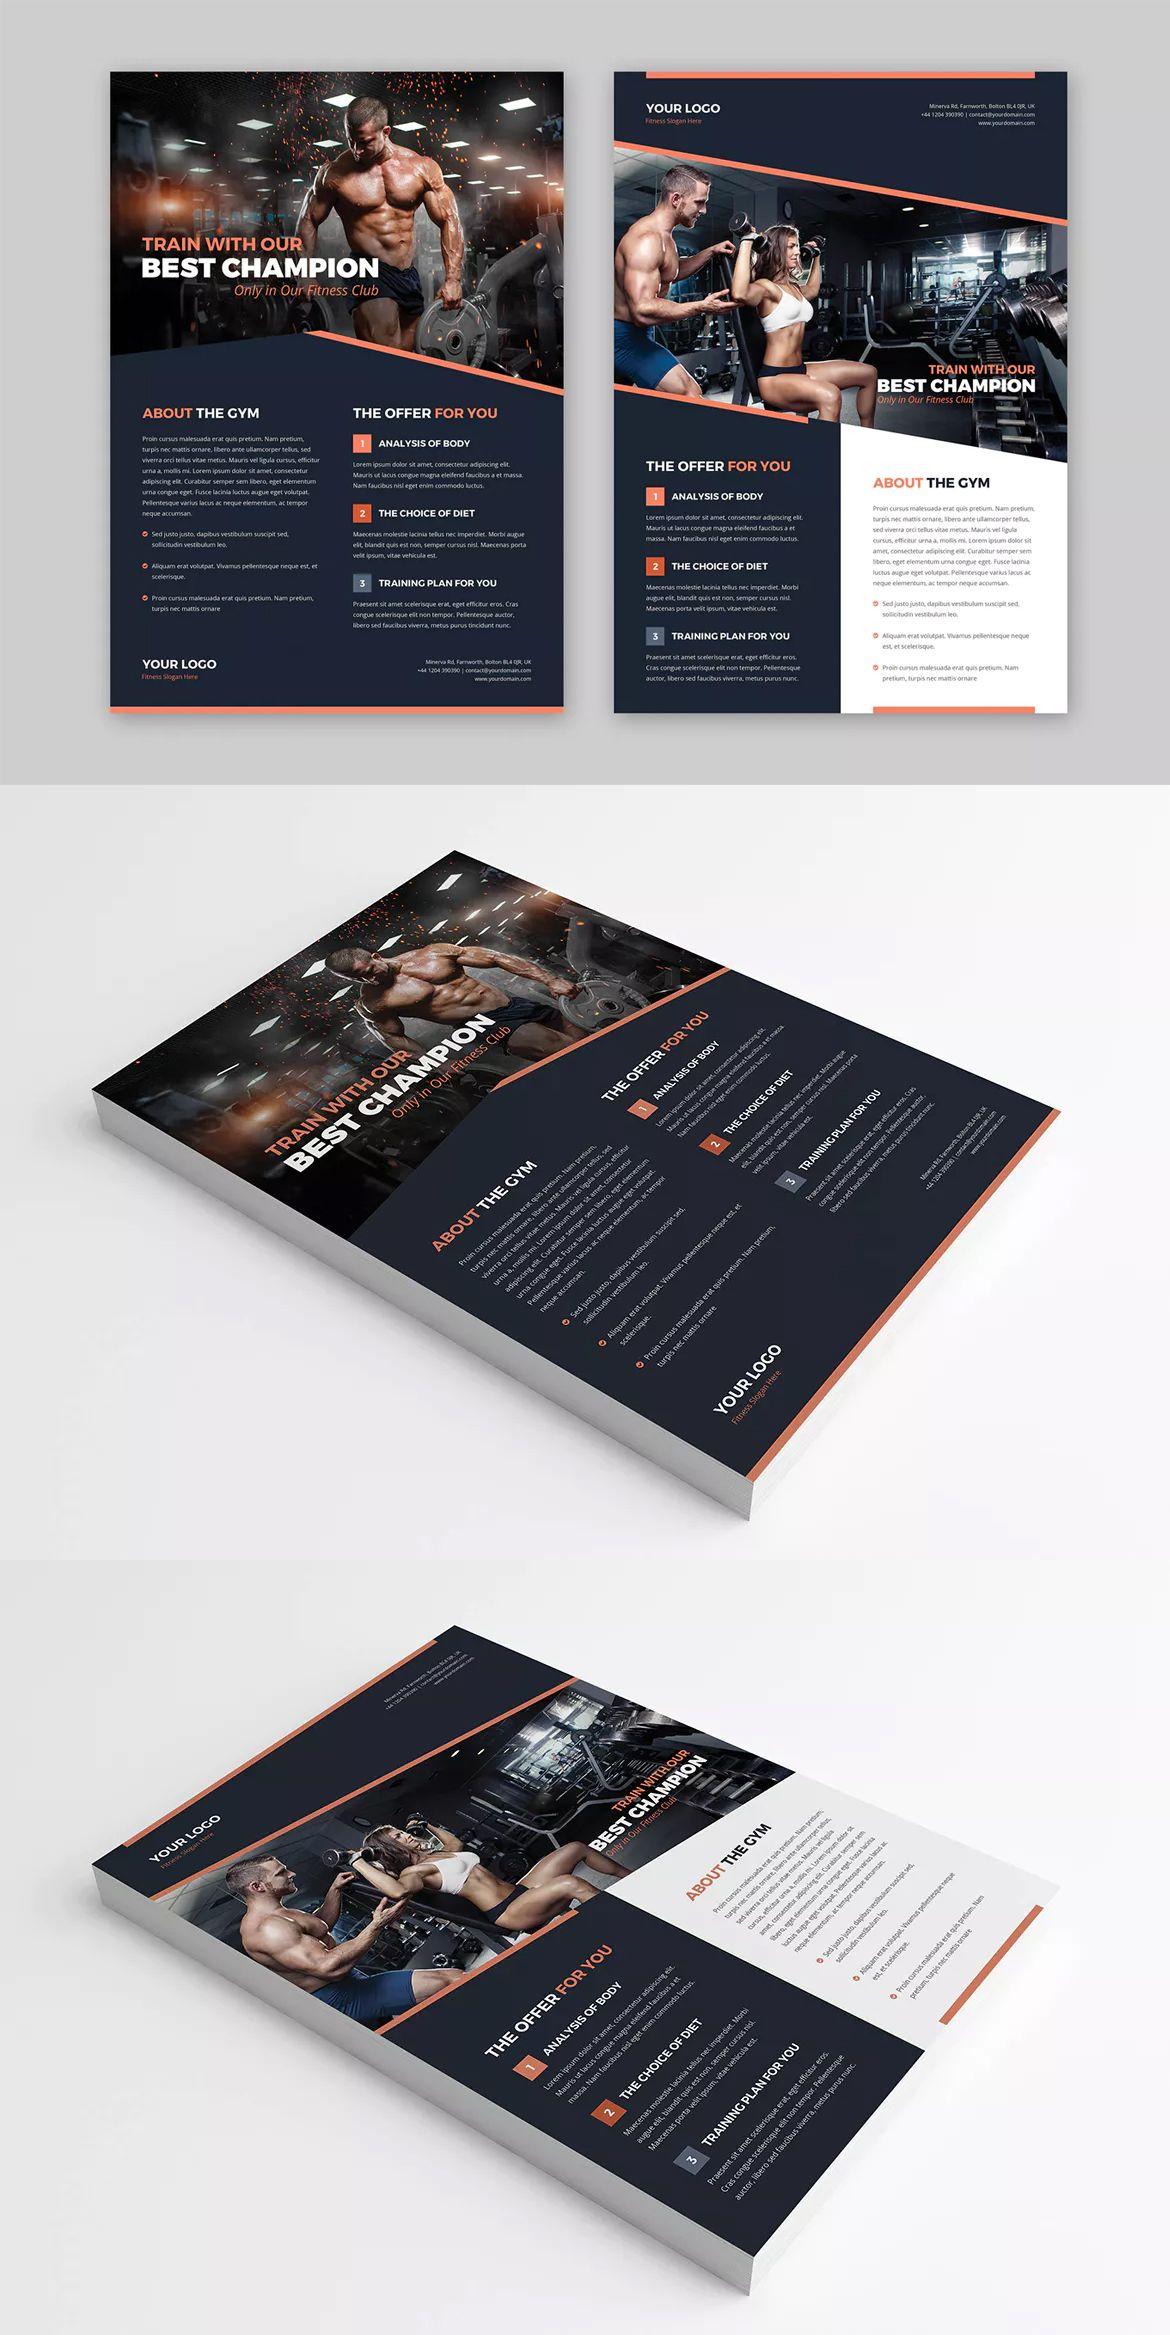 Gym Flyer Template PSD - A4 | Flyer Templates | Magazine layout